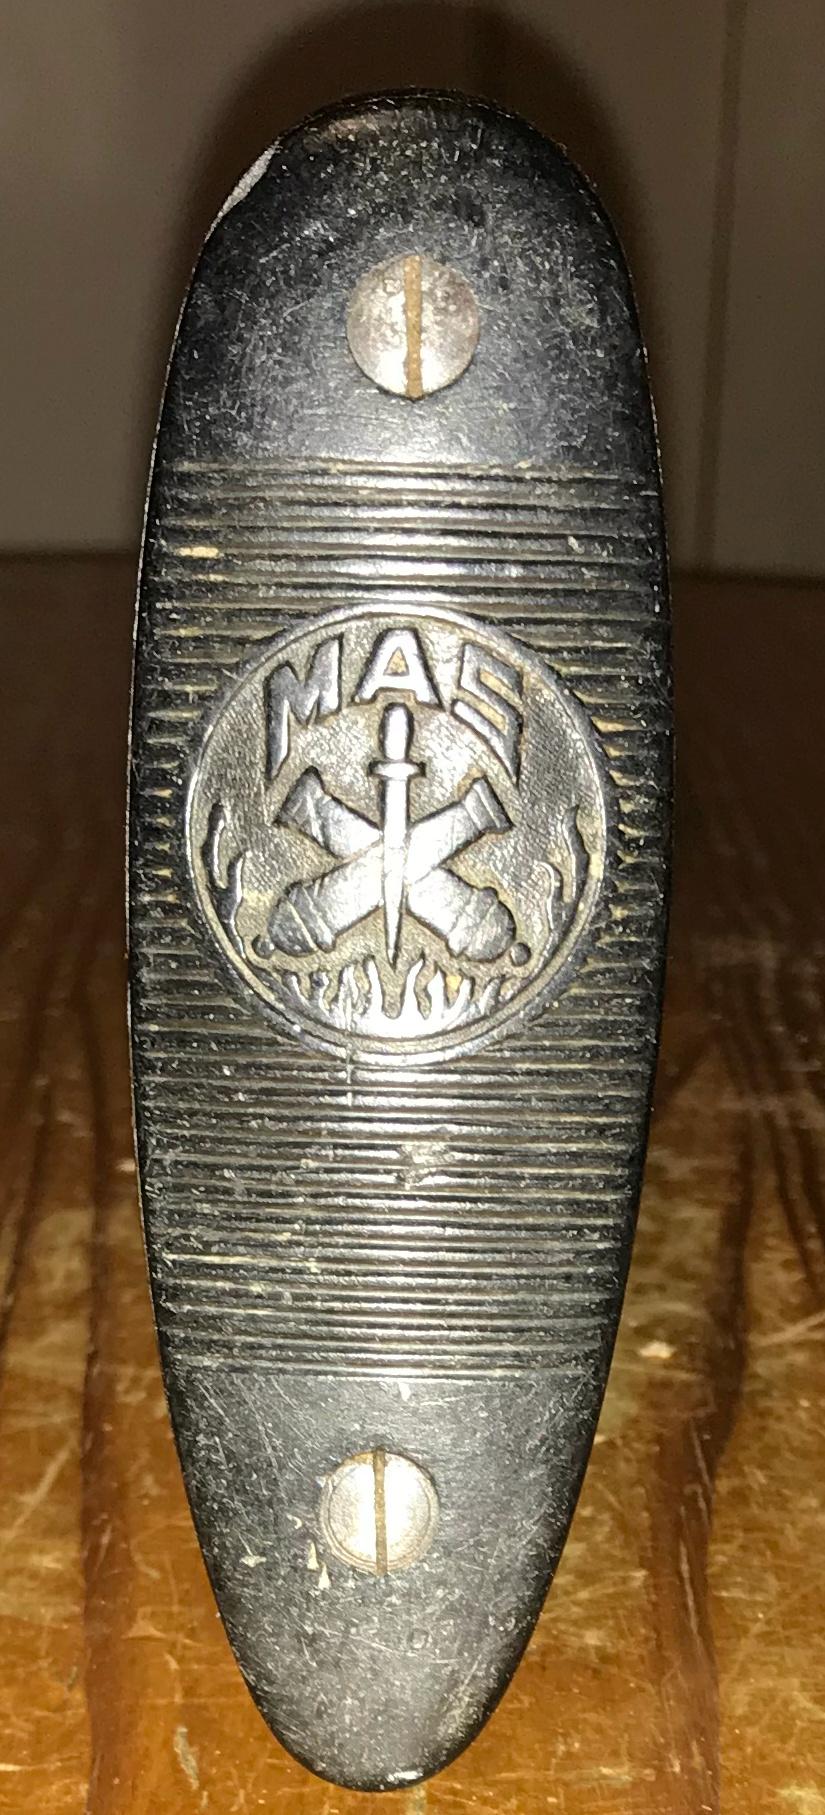 Juxtaposé de la MAS Mas_1910